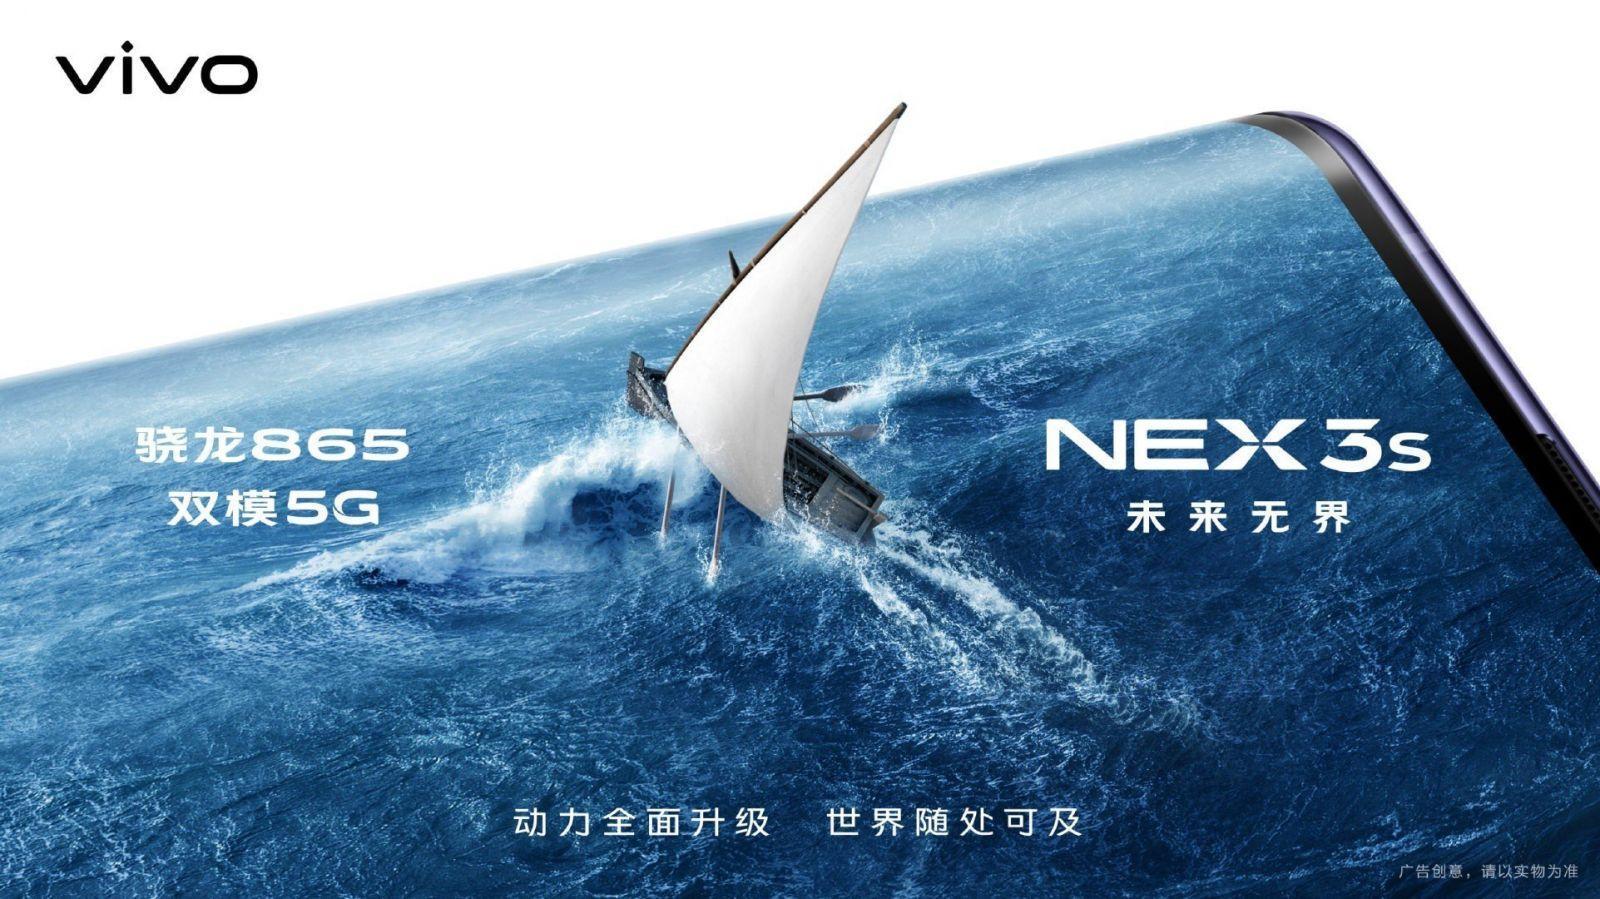 Vivo представила новый смартфон Vivo NEX 3S 5G (gsmarena 001 1)